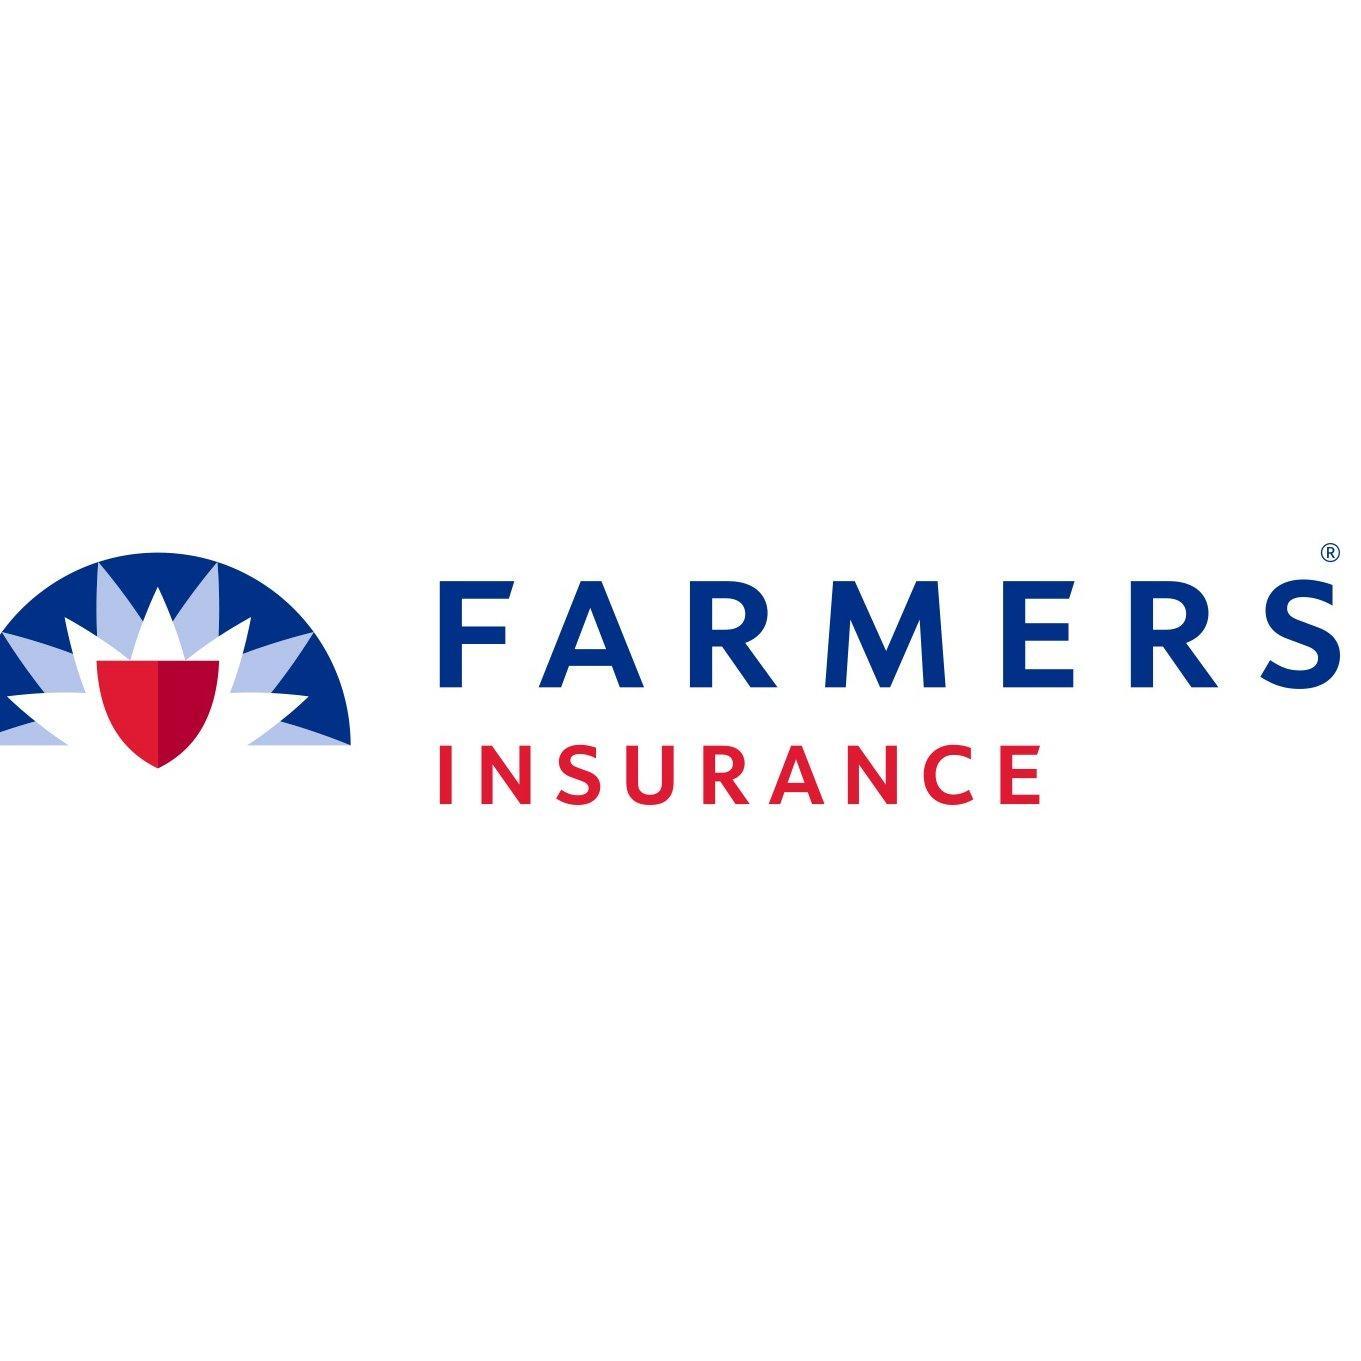 Farmers Insurance Gus  Calero  Agency